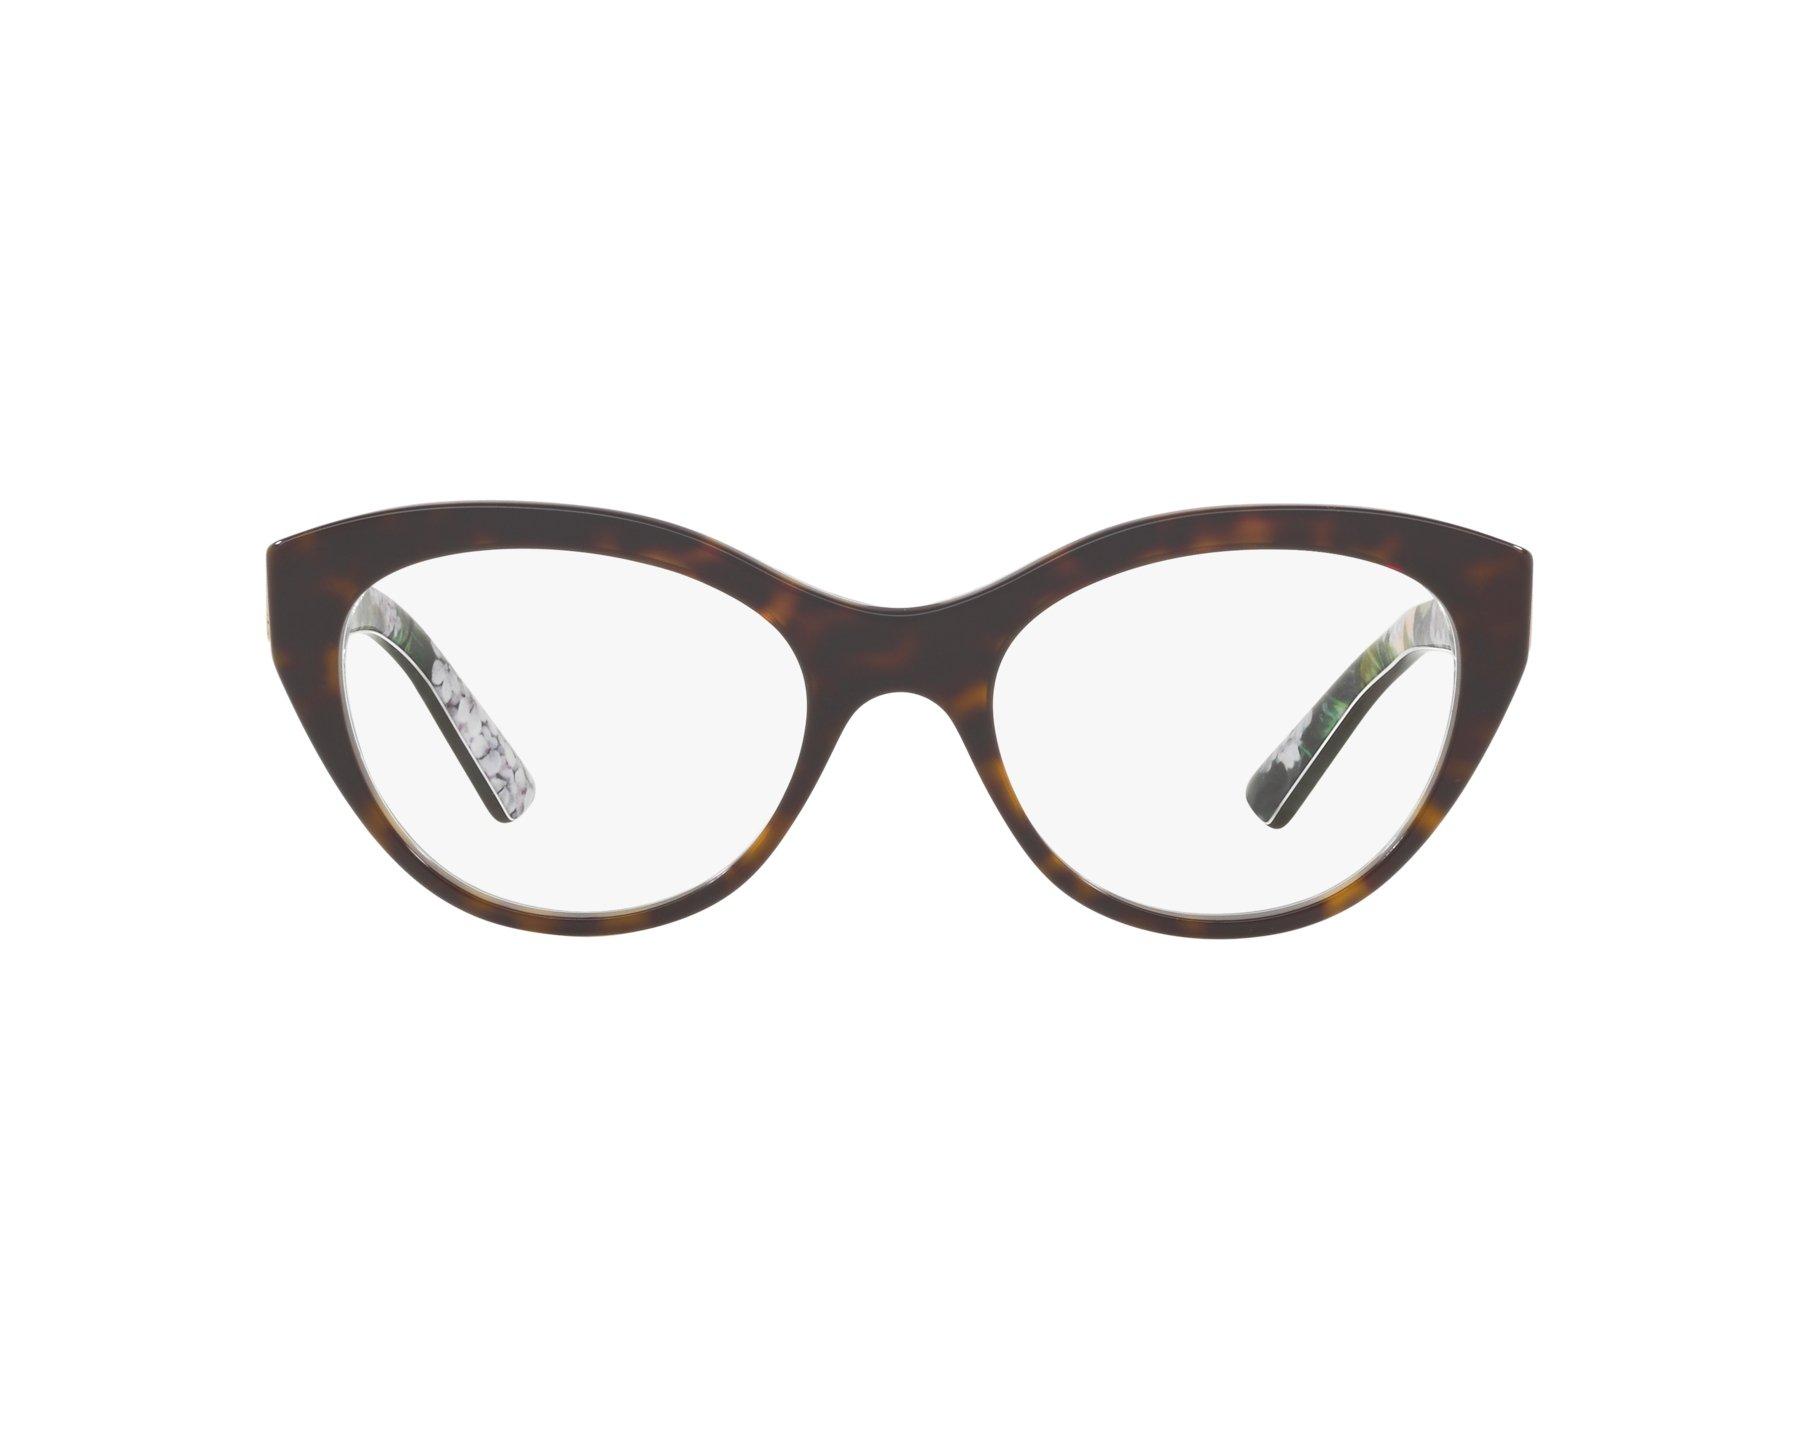 6f0b0d71856 eyeglasses Dolce   Gabbana DG-3246 3151 - Havana Green 360 degree view 1